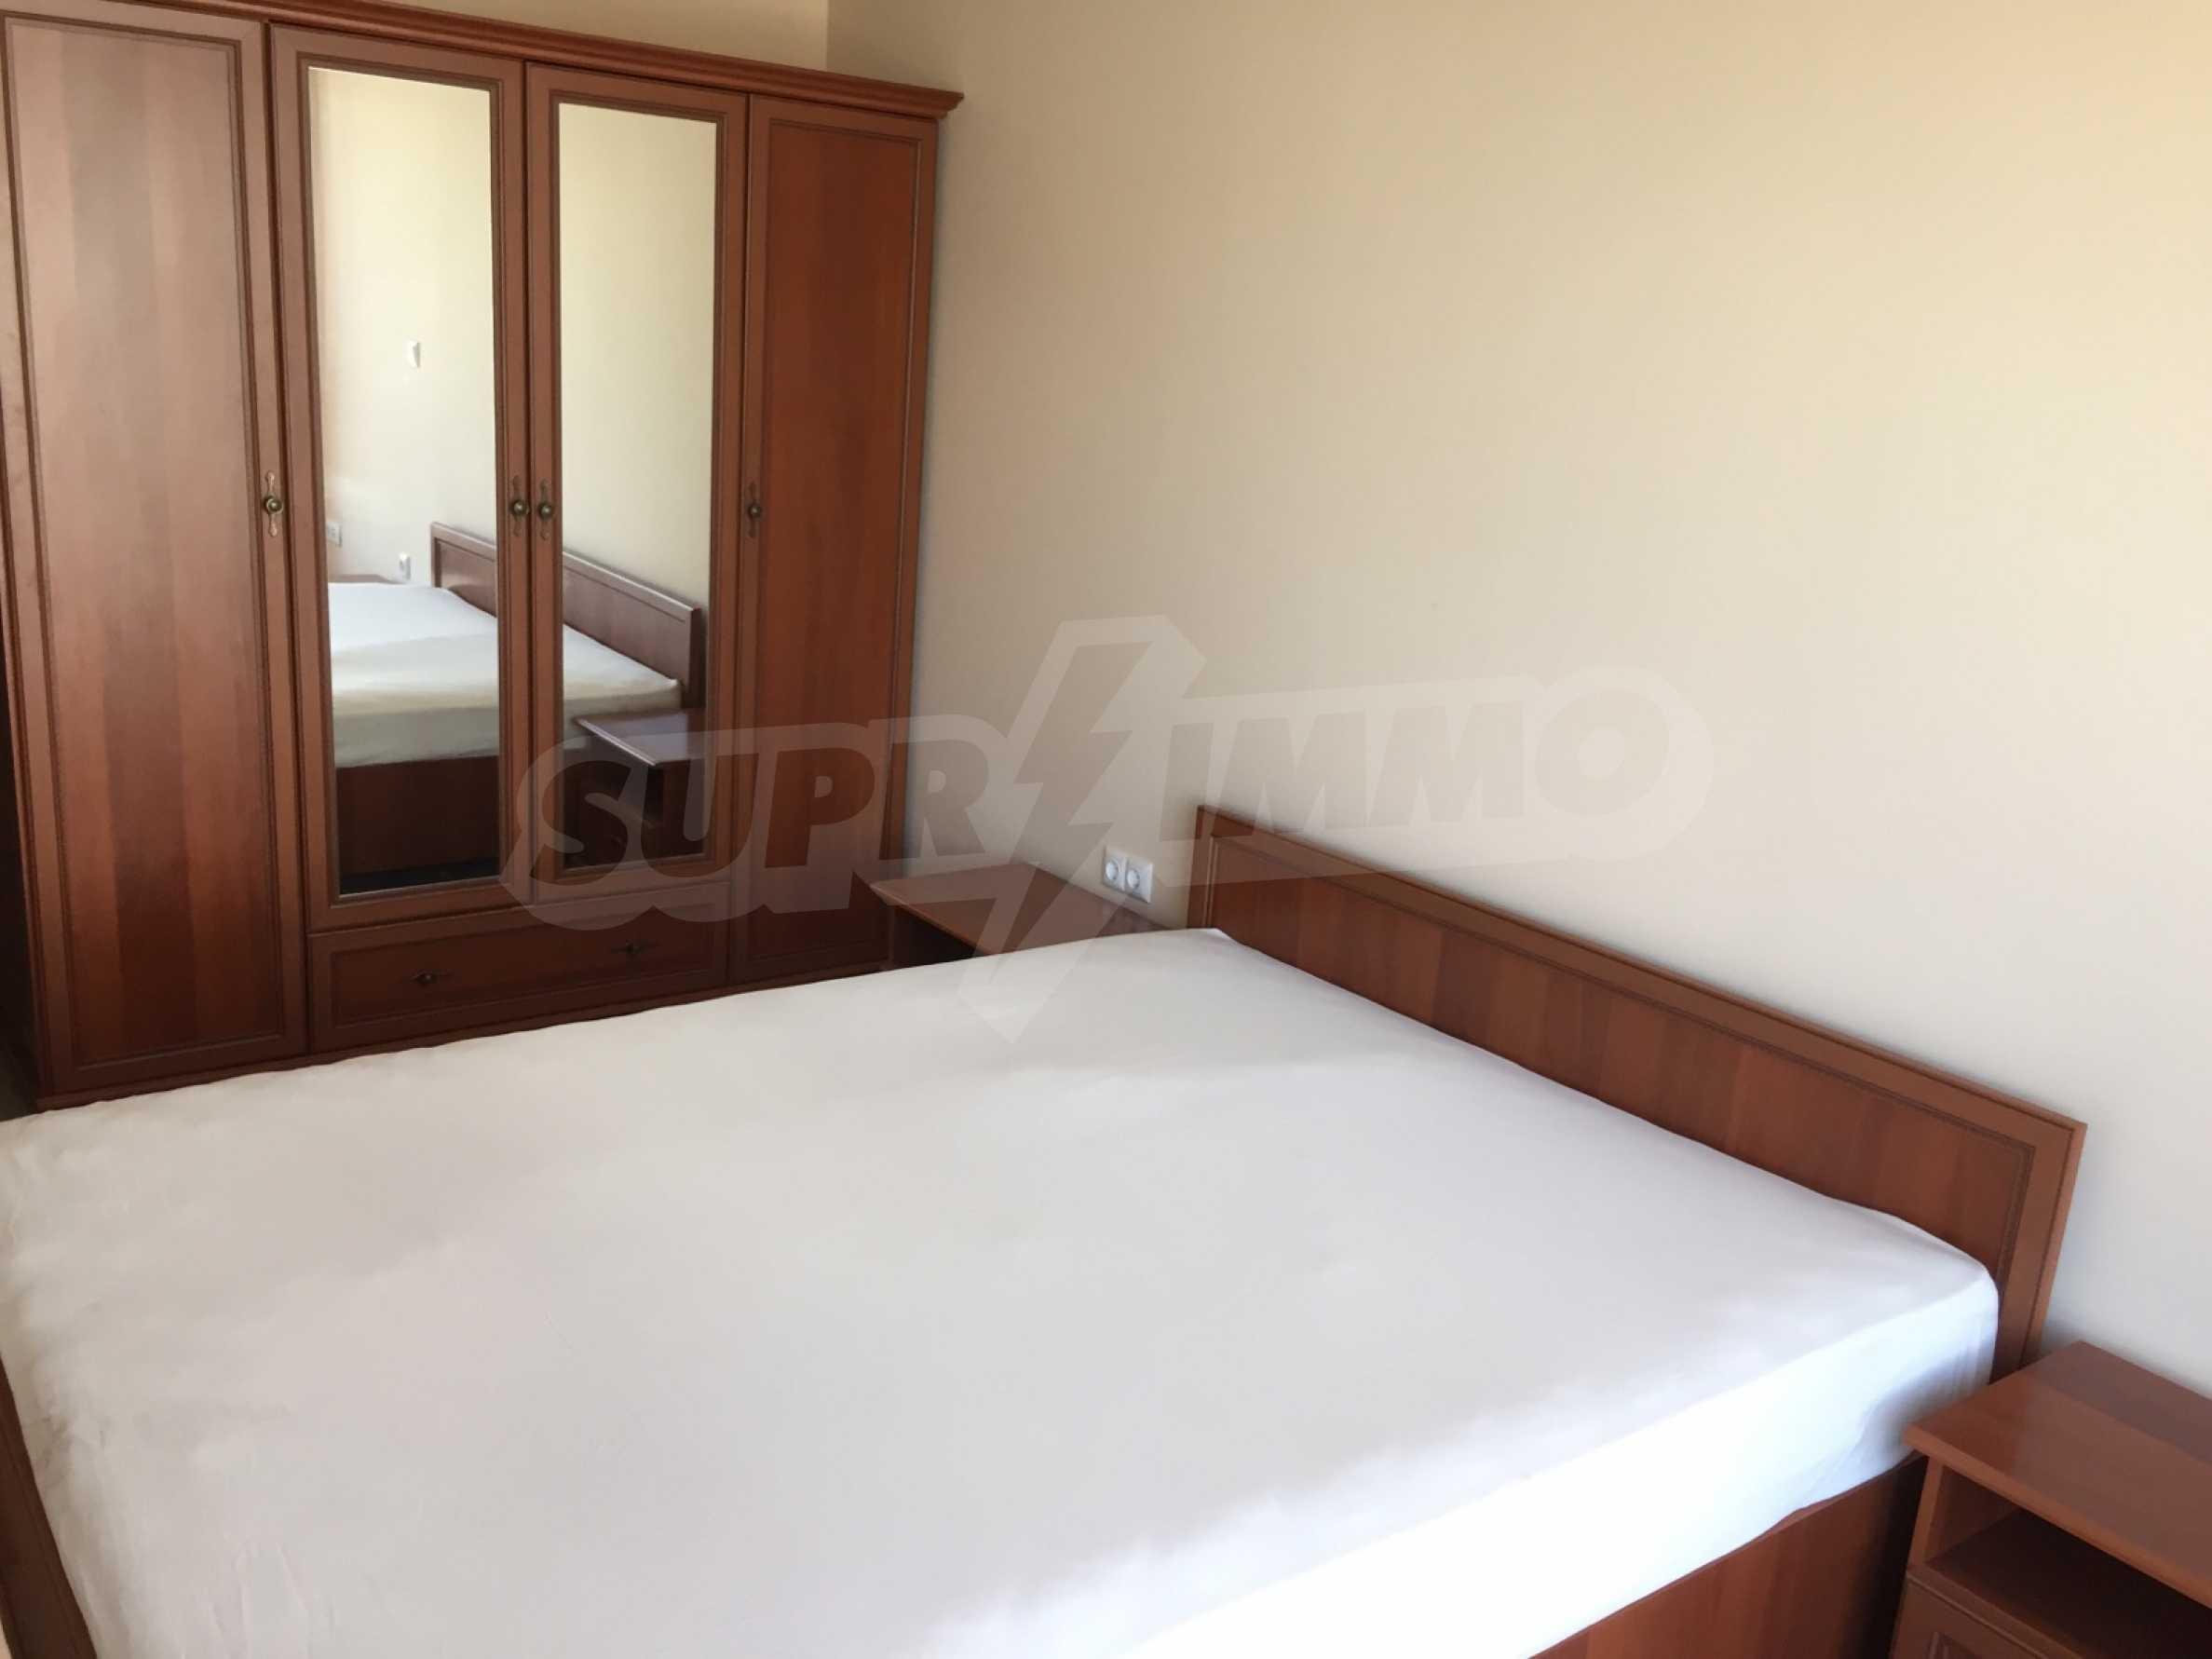 Cozy, one-bedroom apartment for rent in Studentski grad near NSA 3